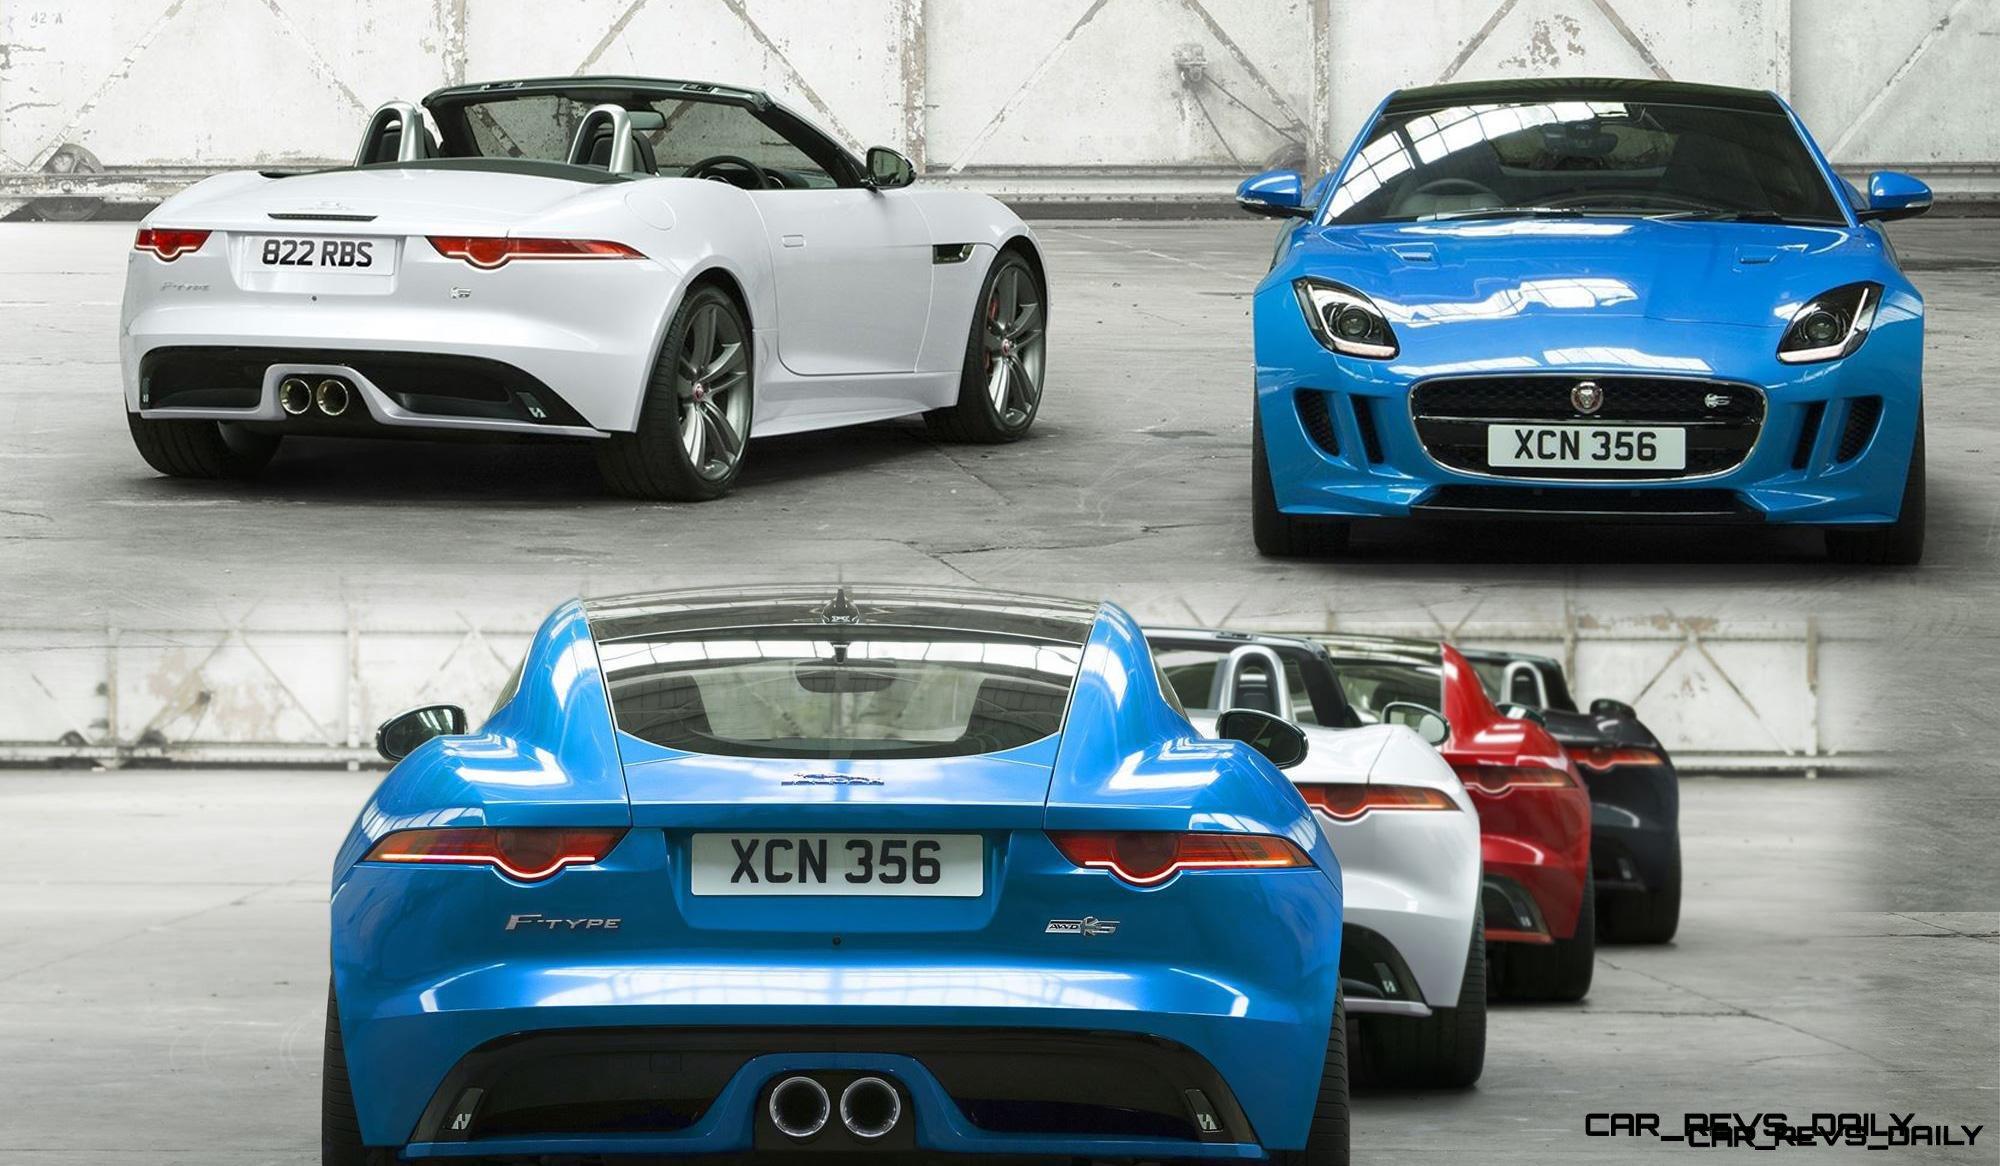 2016-Jaguar-F-TYPE-British-Design-Edition-17a